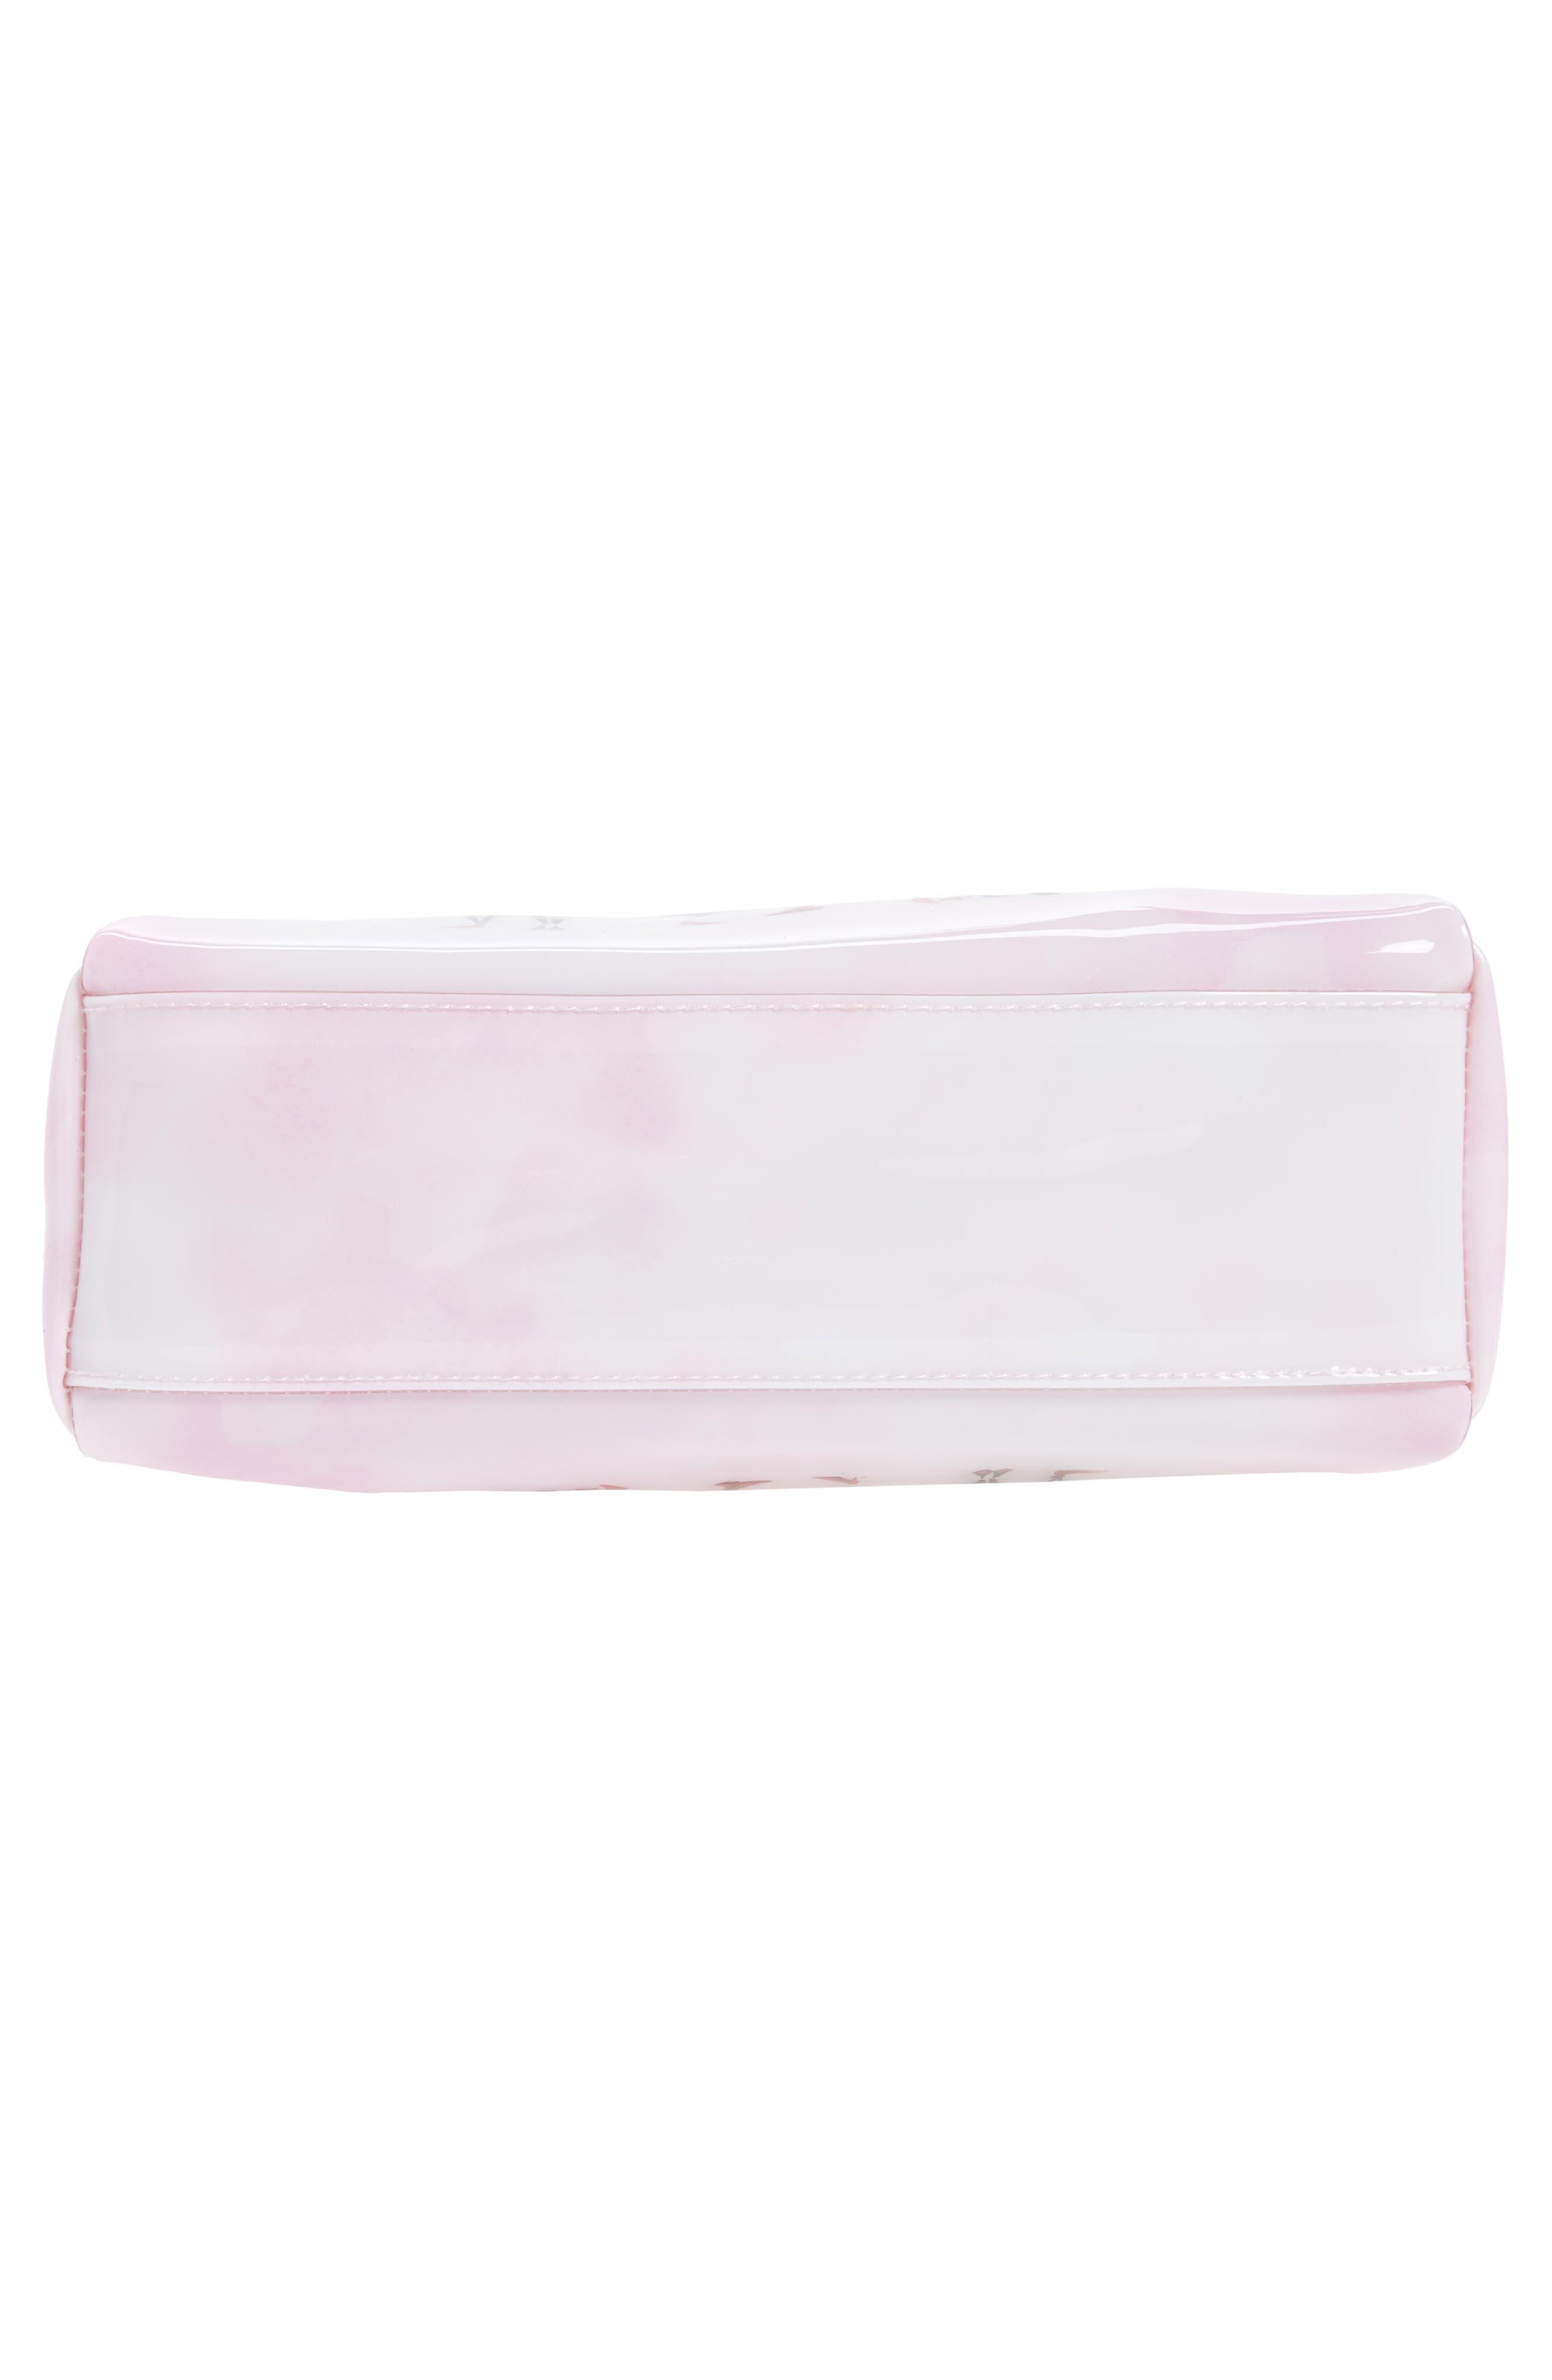 Watercolor Women Large Cosmetics Case,                             Alternate thumbnail 5, color,                             Pink